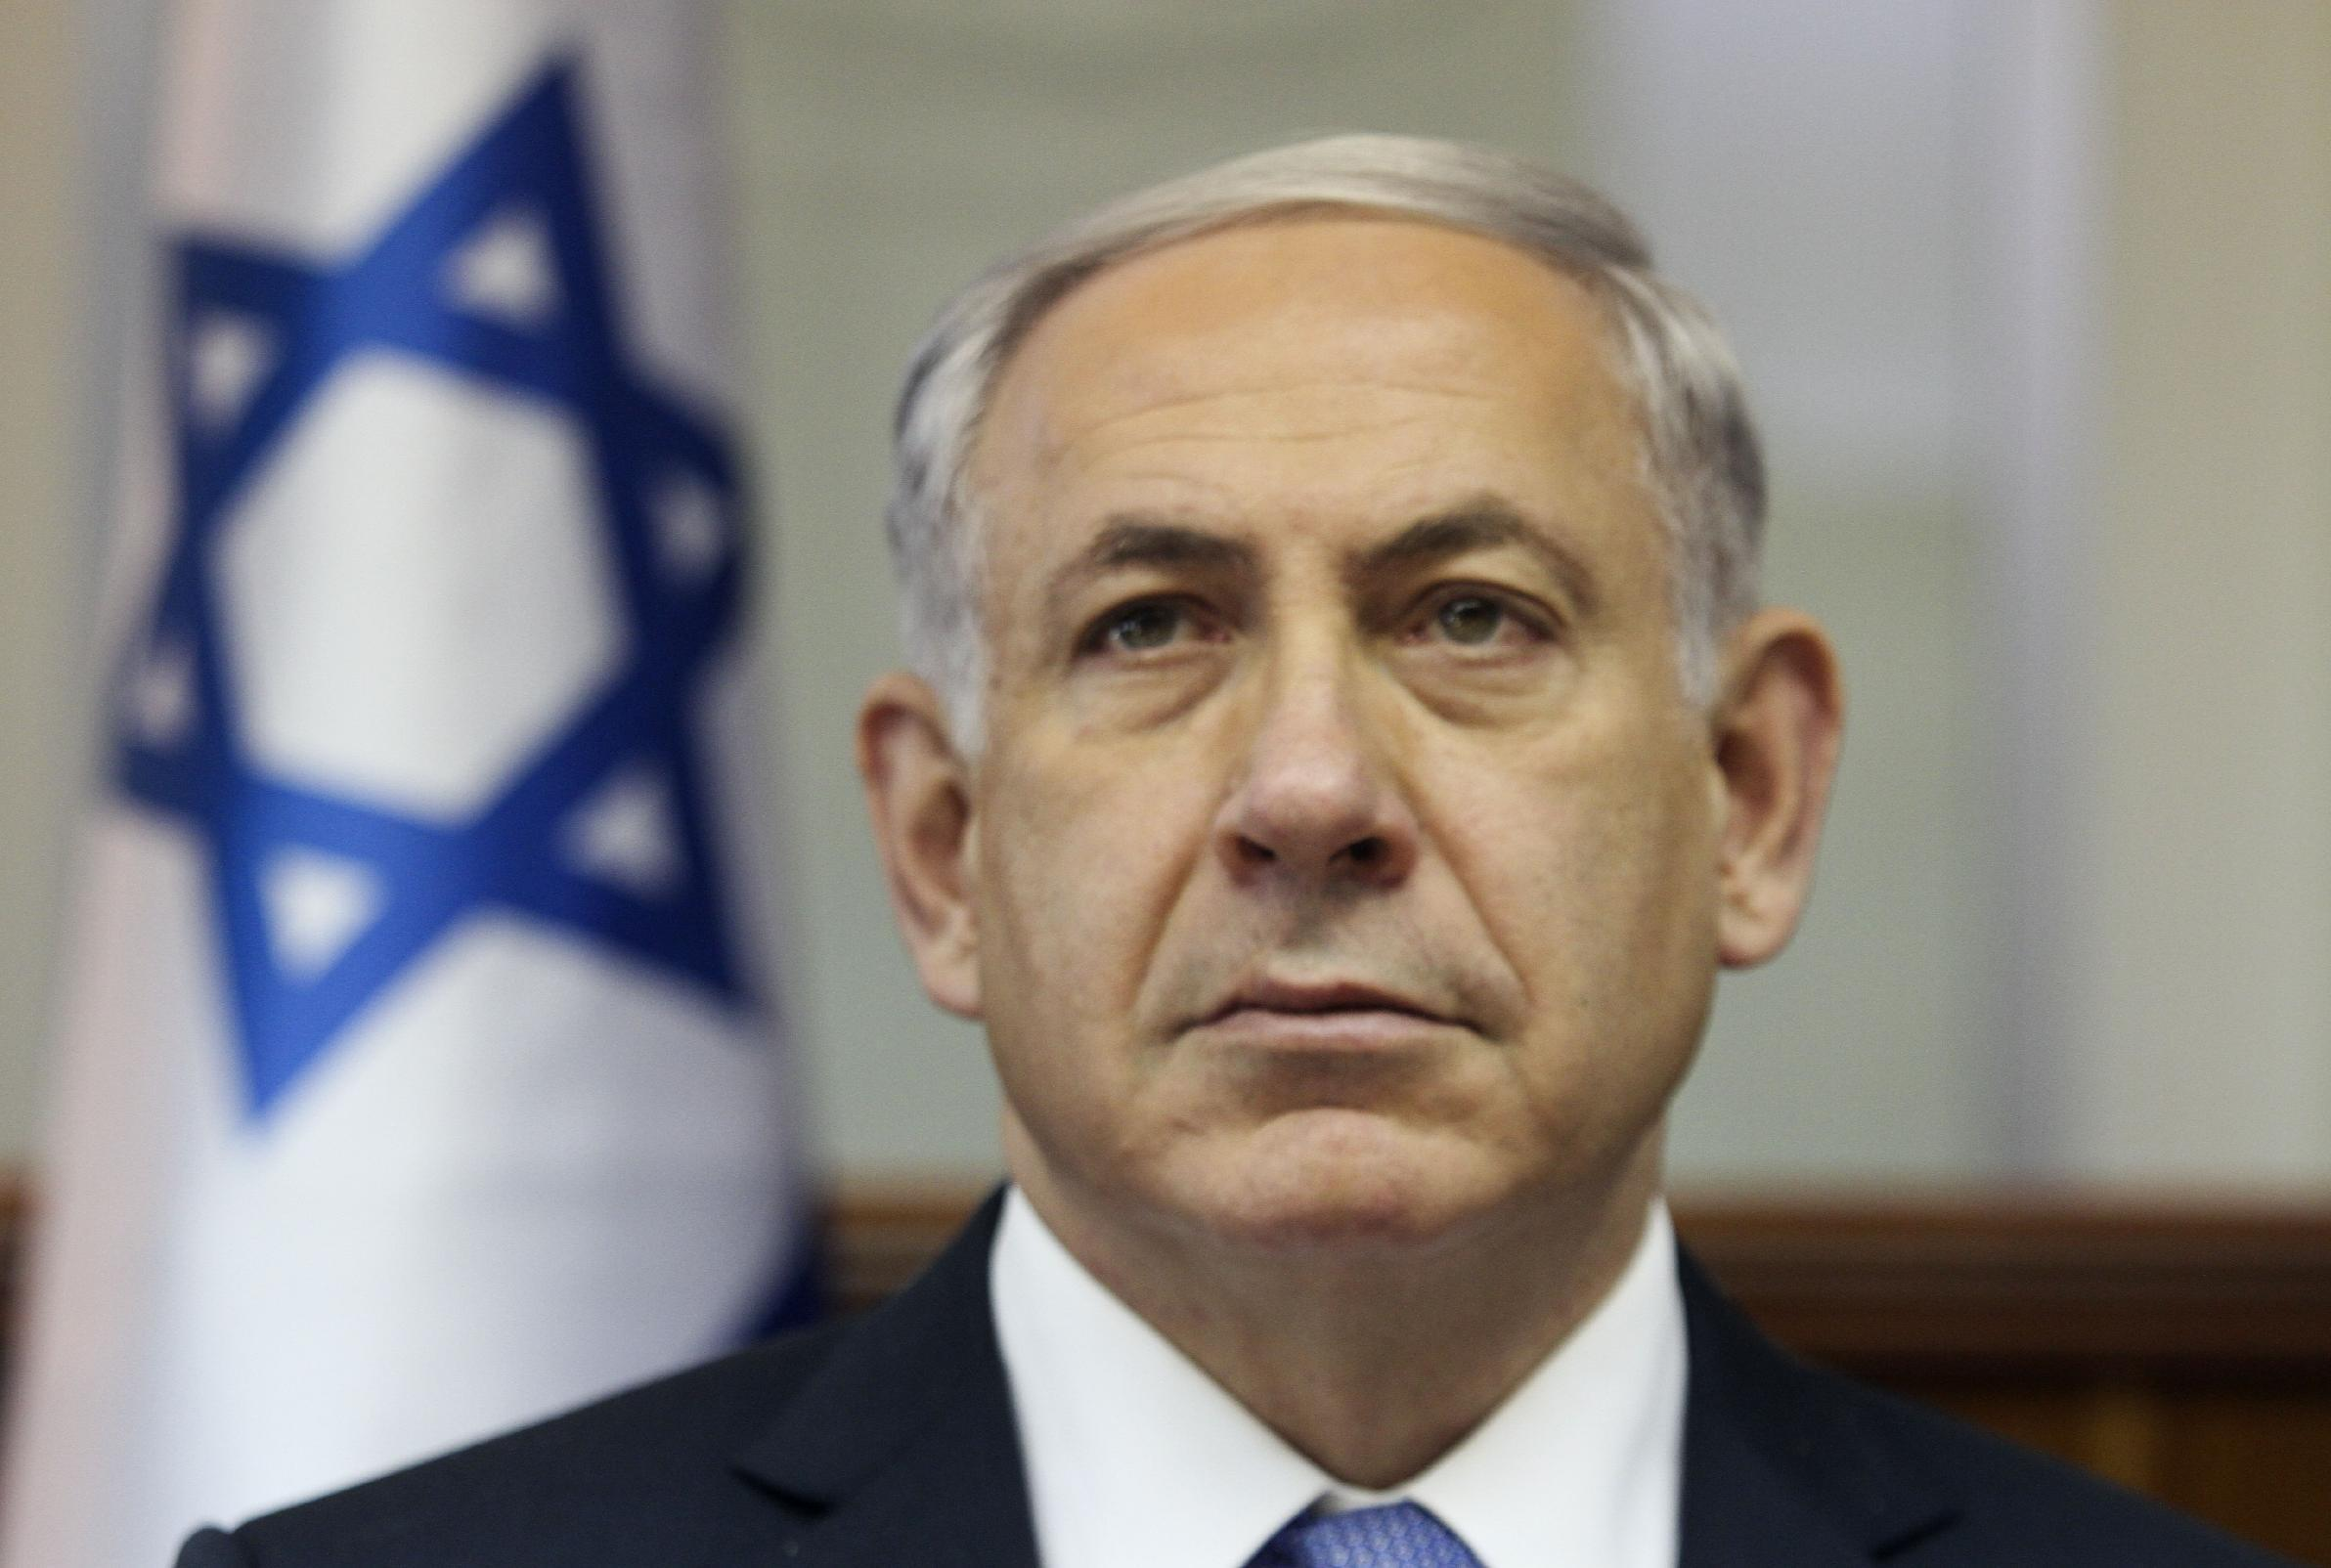 Israeli Prime Minister Benjamin Netanyahu attends a cabinet meeting in Jerusalem on October 7, 2014